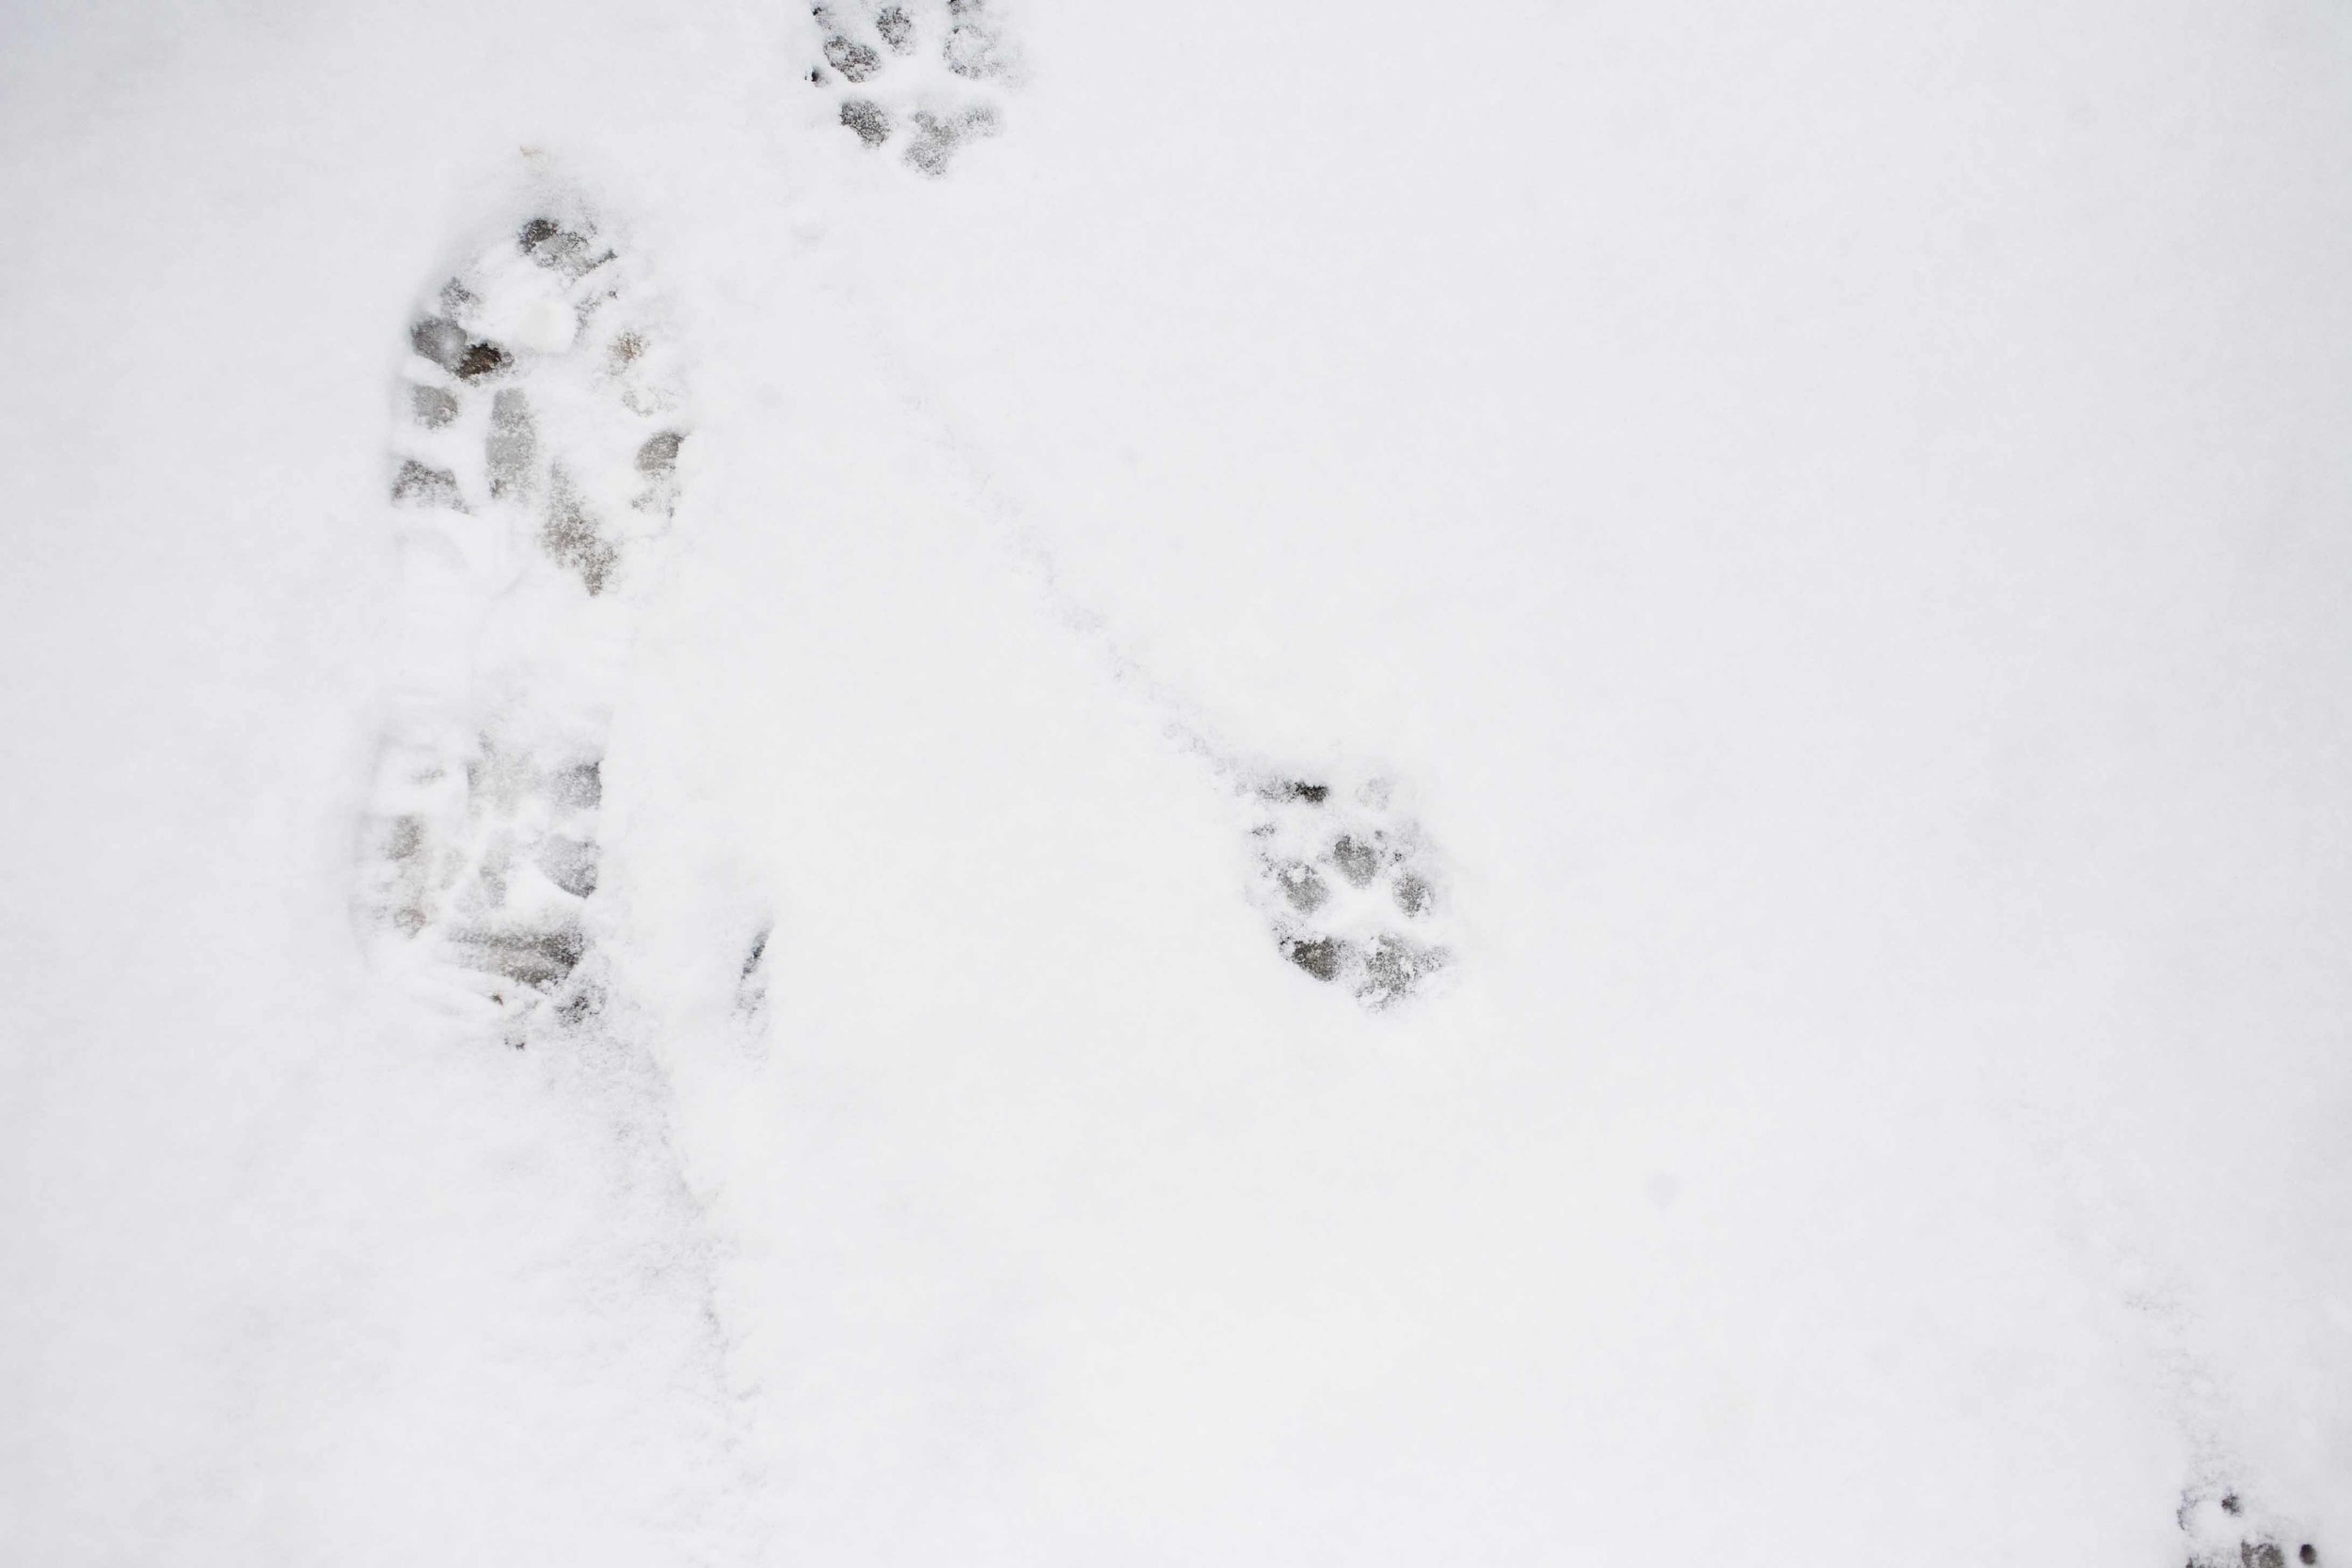 SNOW DAY ARIANA CLARE_14.jpg